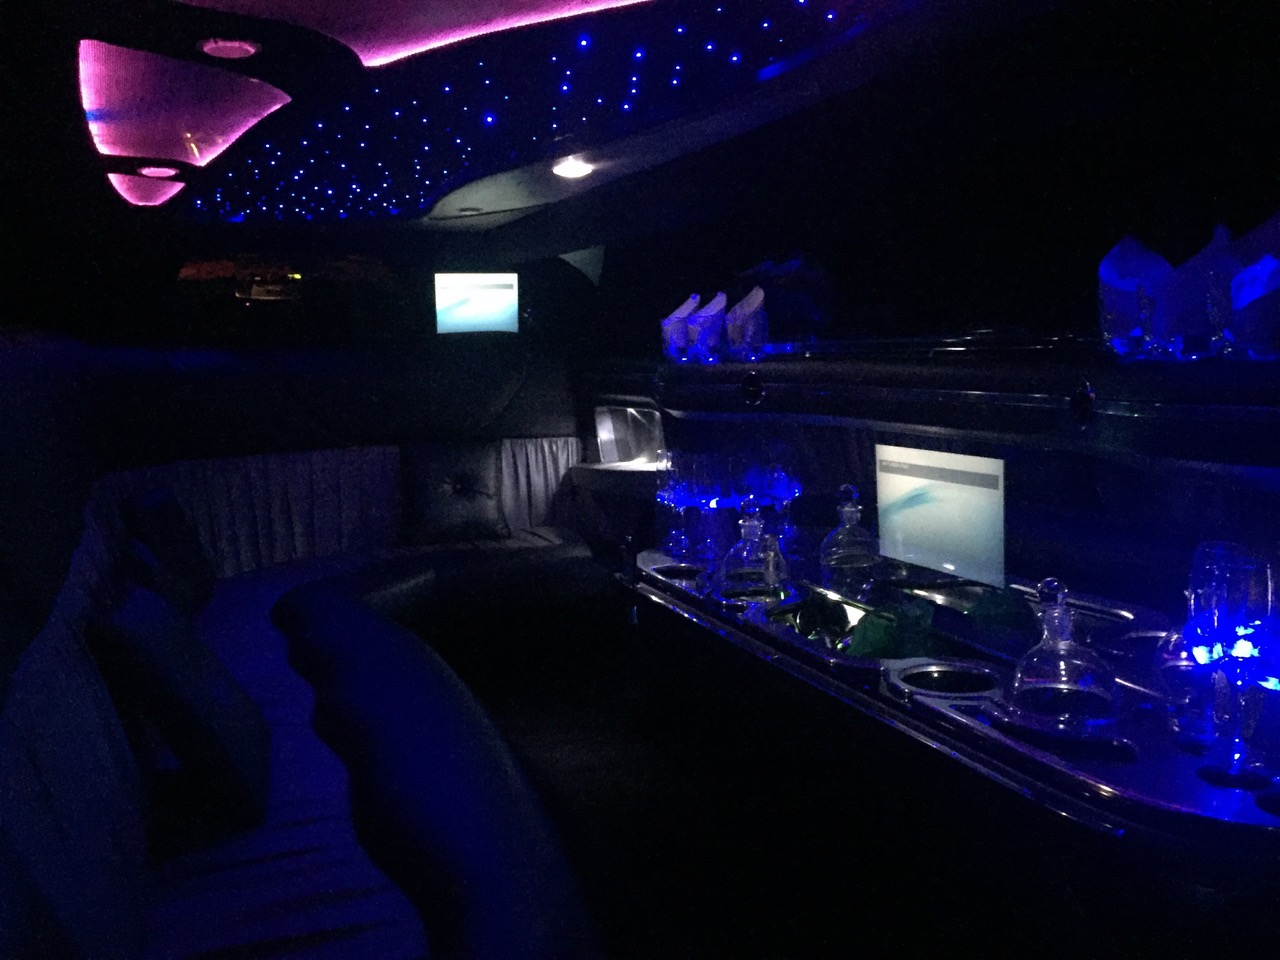 chrysler-limo-interior3